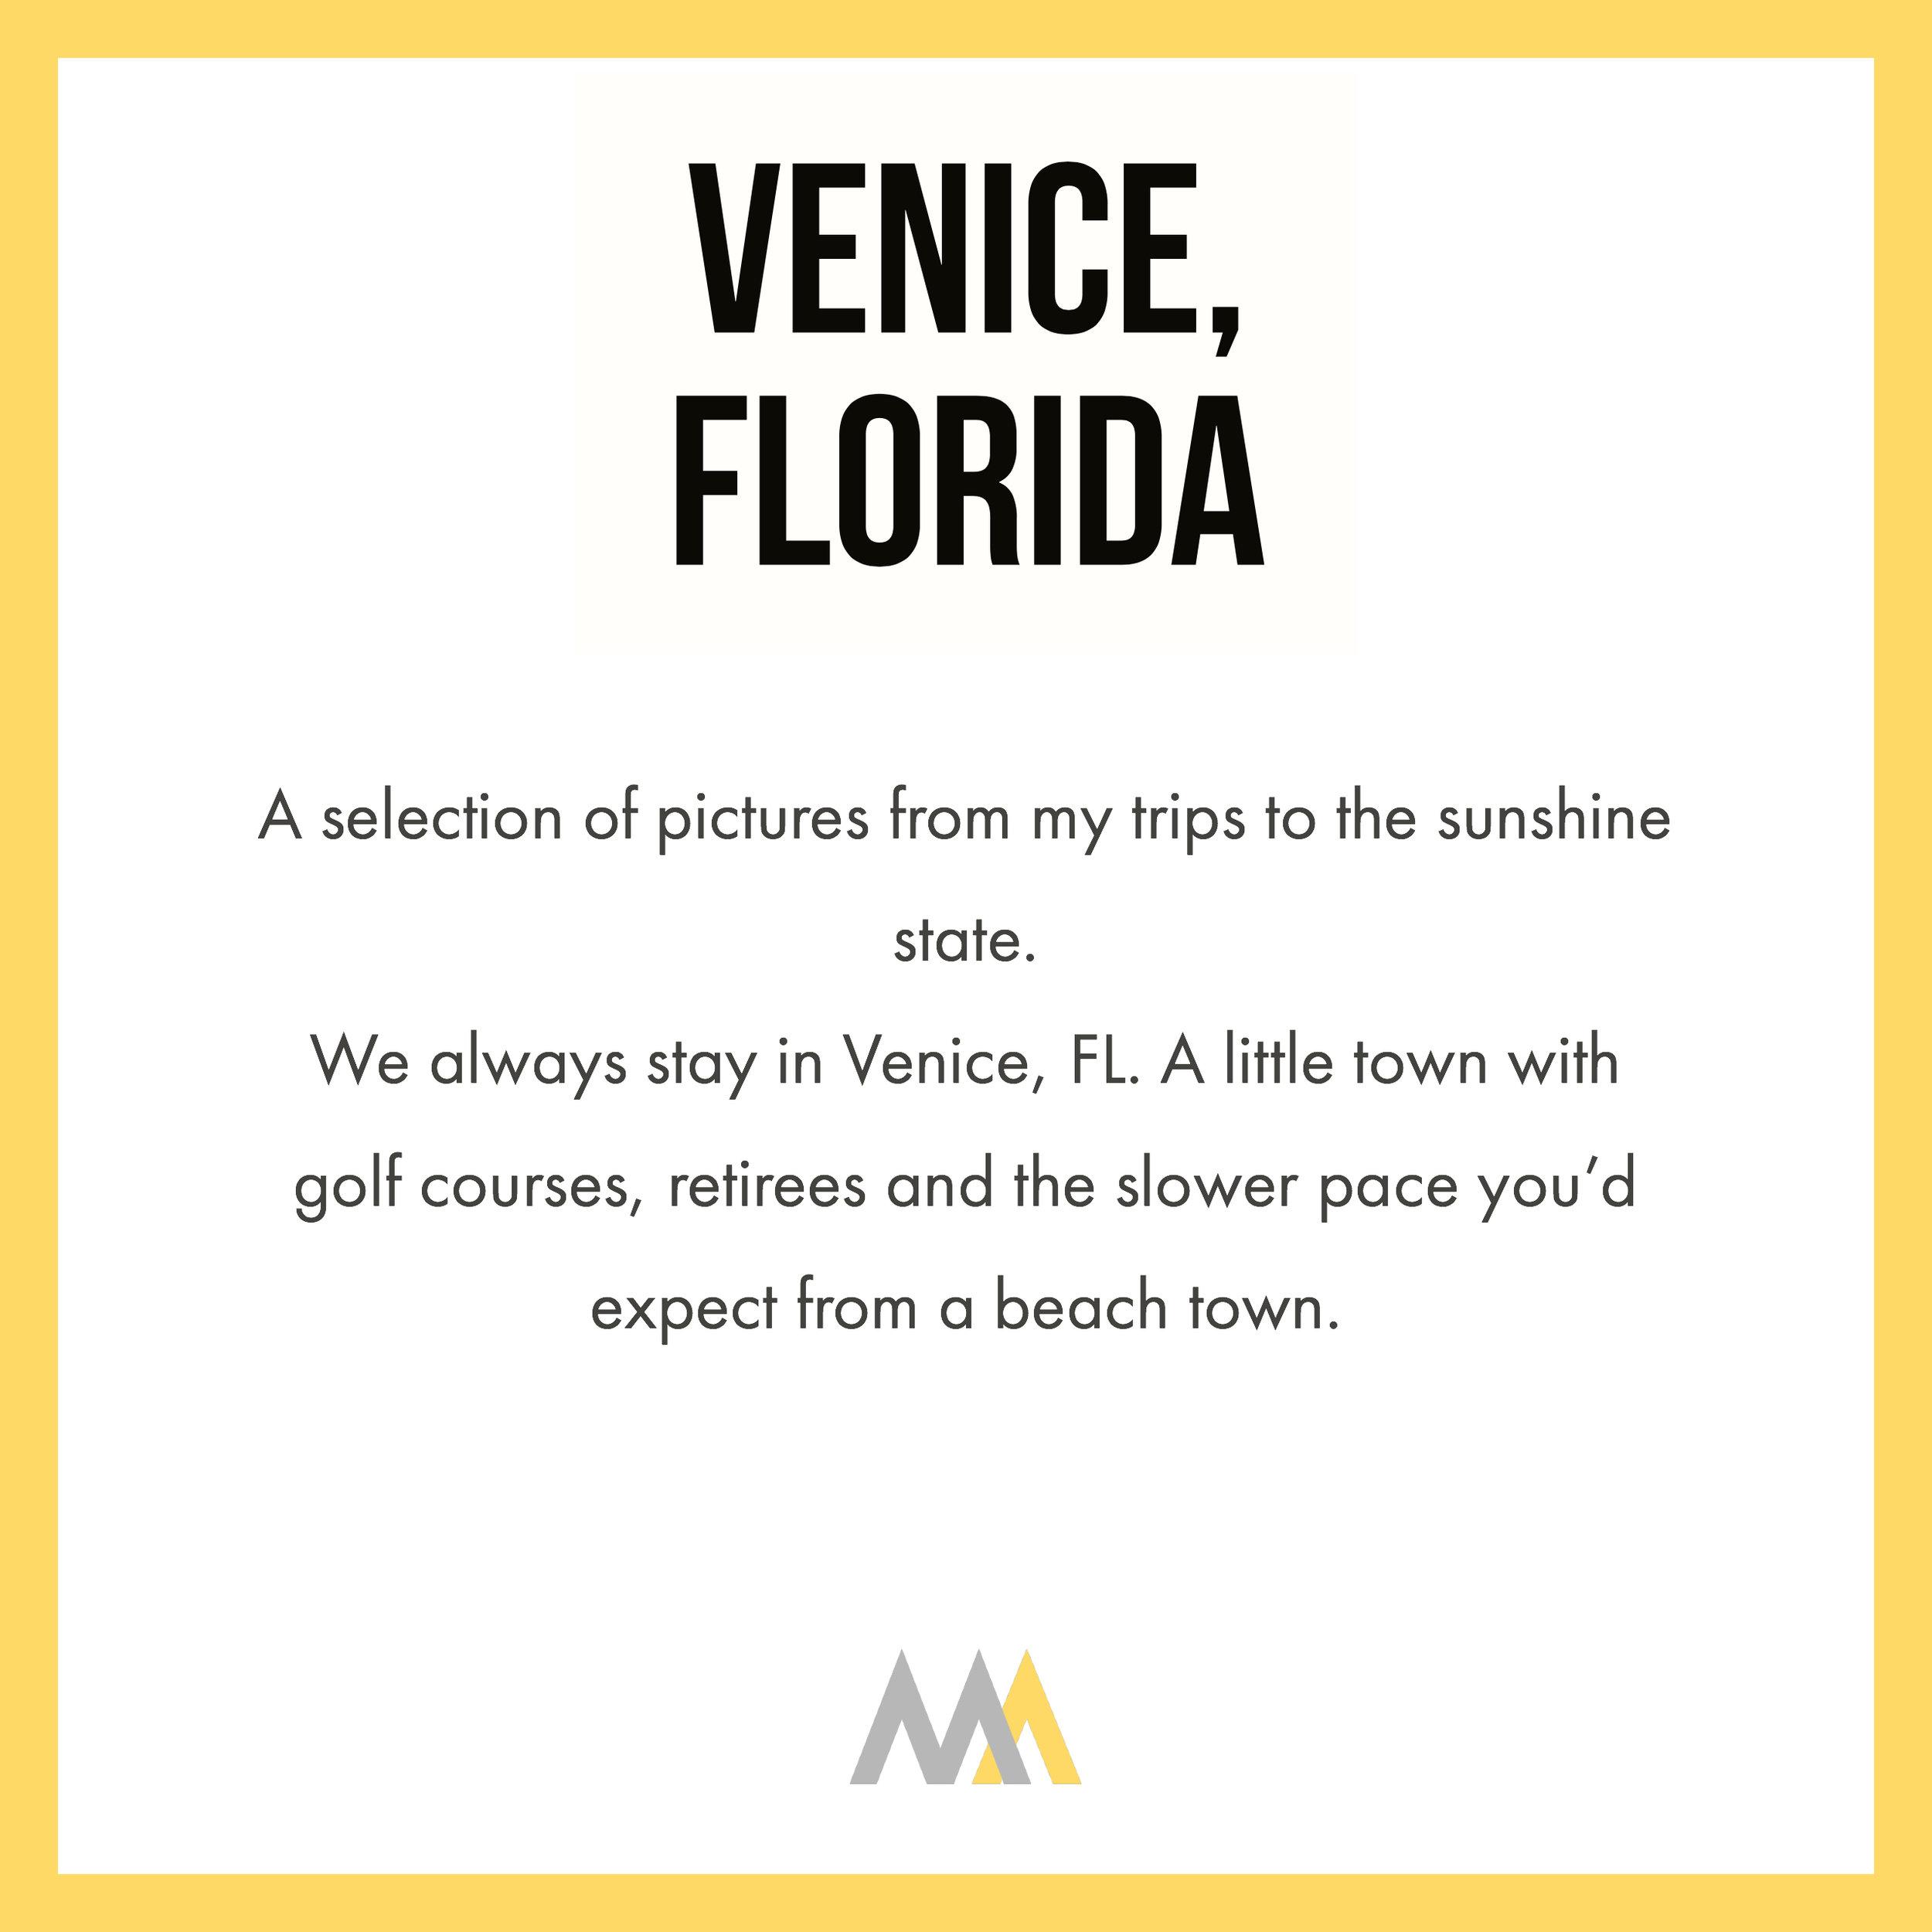 Venice, VeniceFlorida.jpg